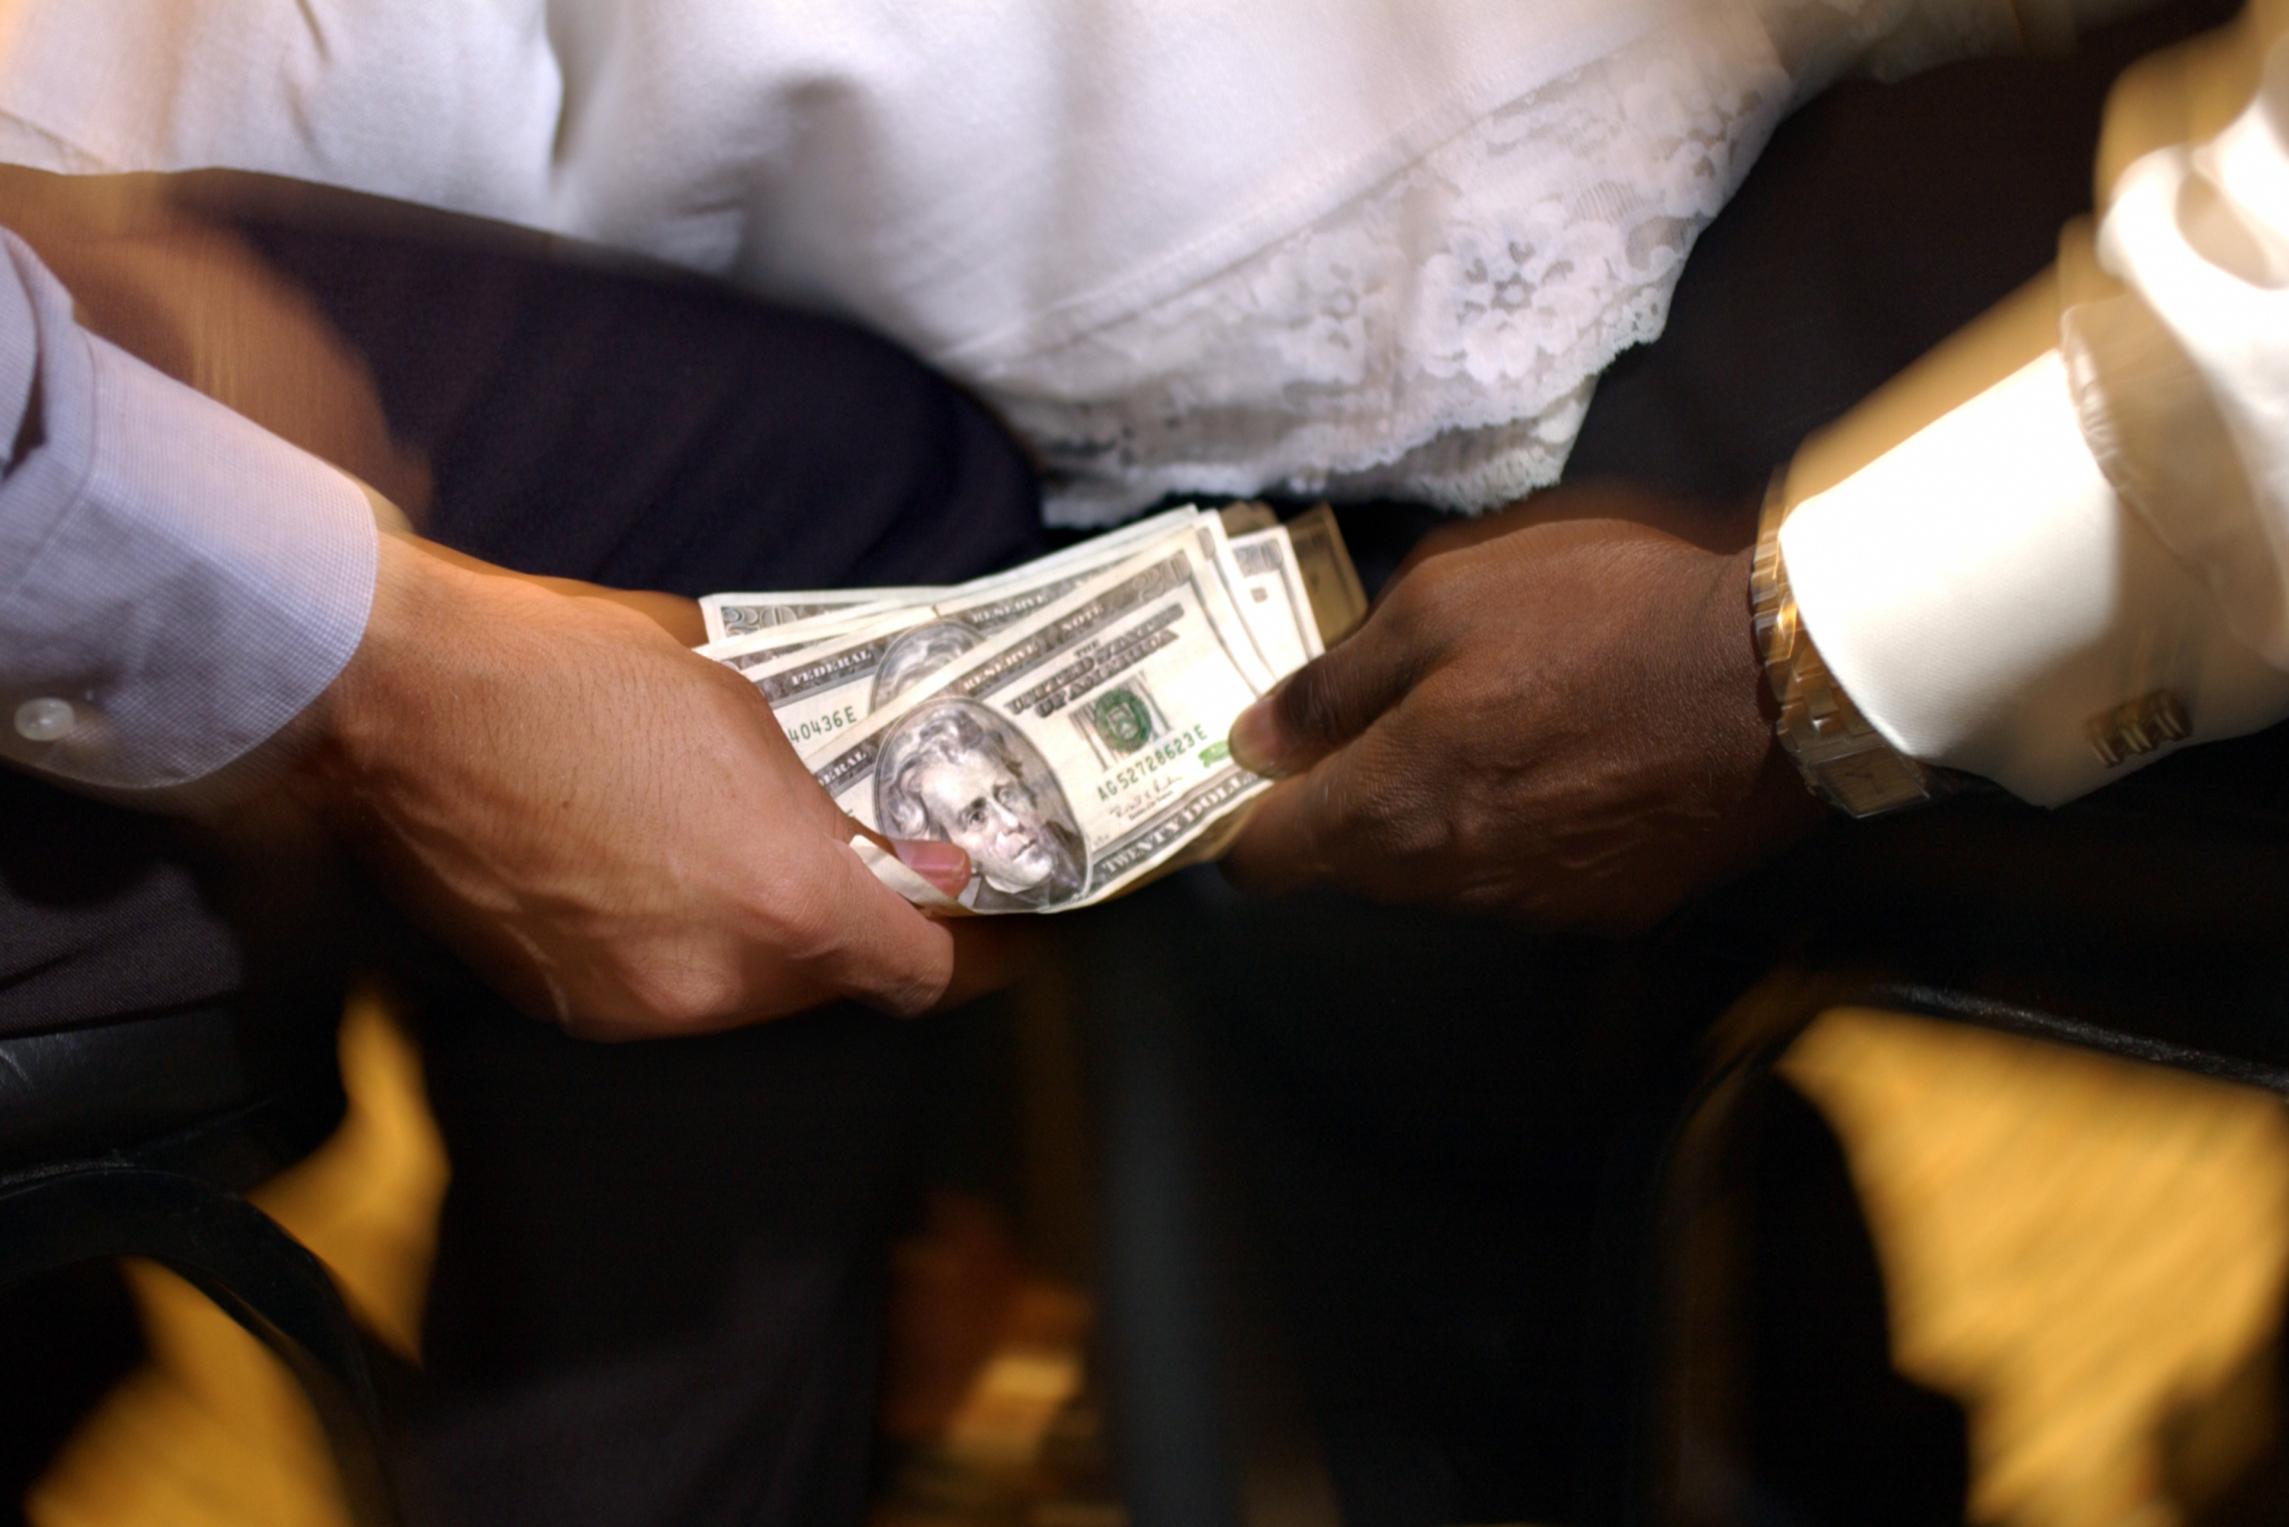 crime money steal embezzle 2